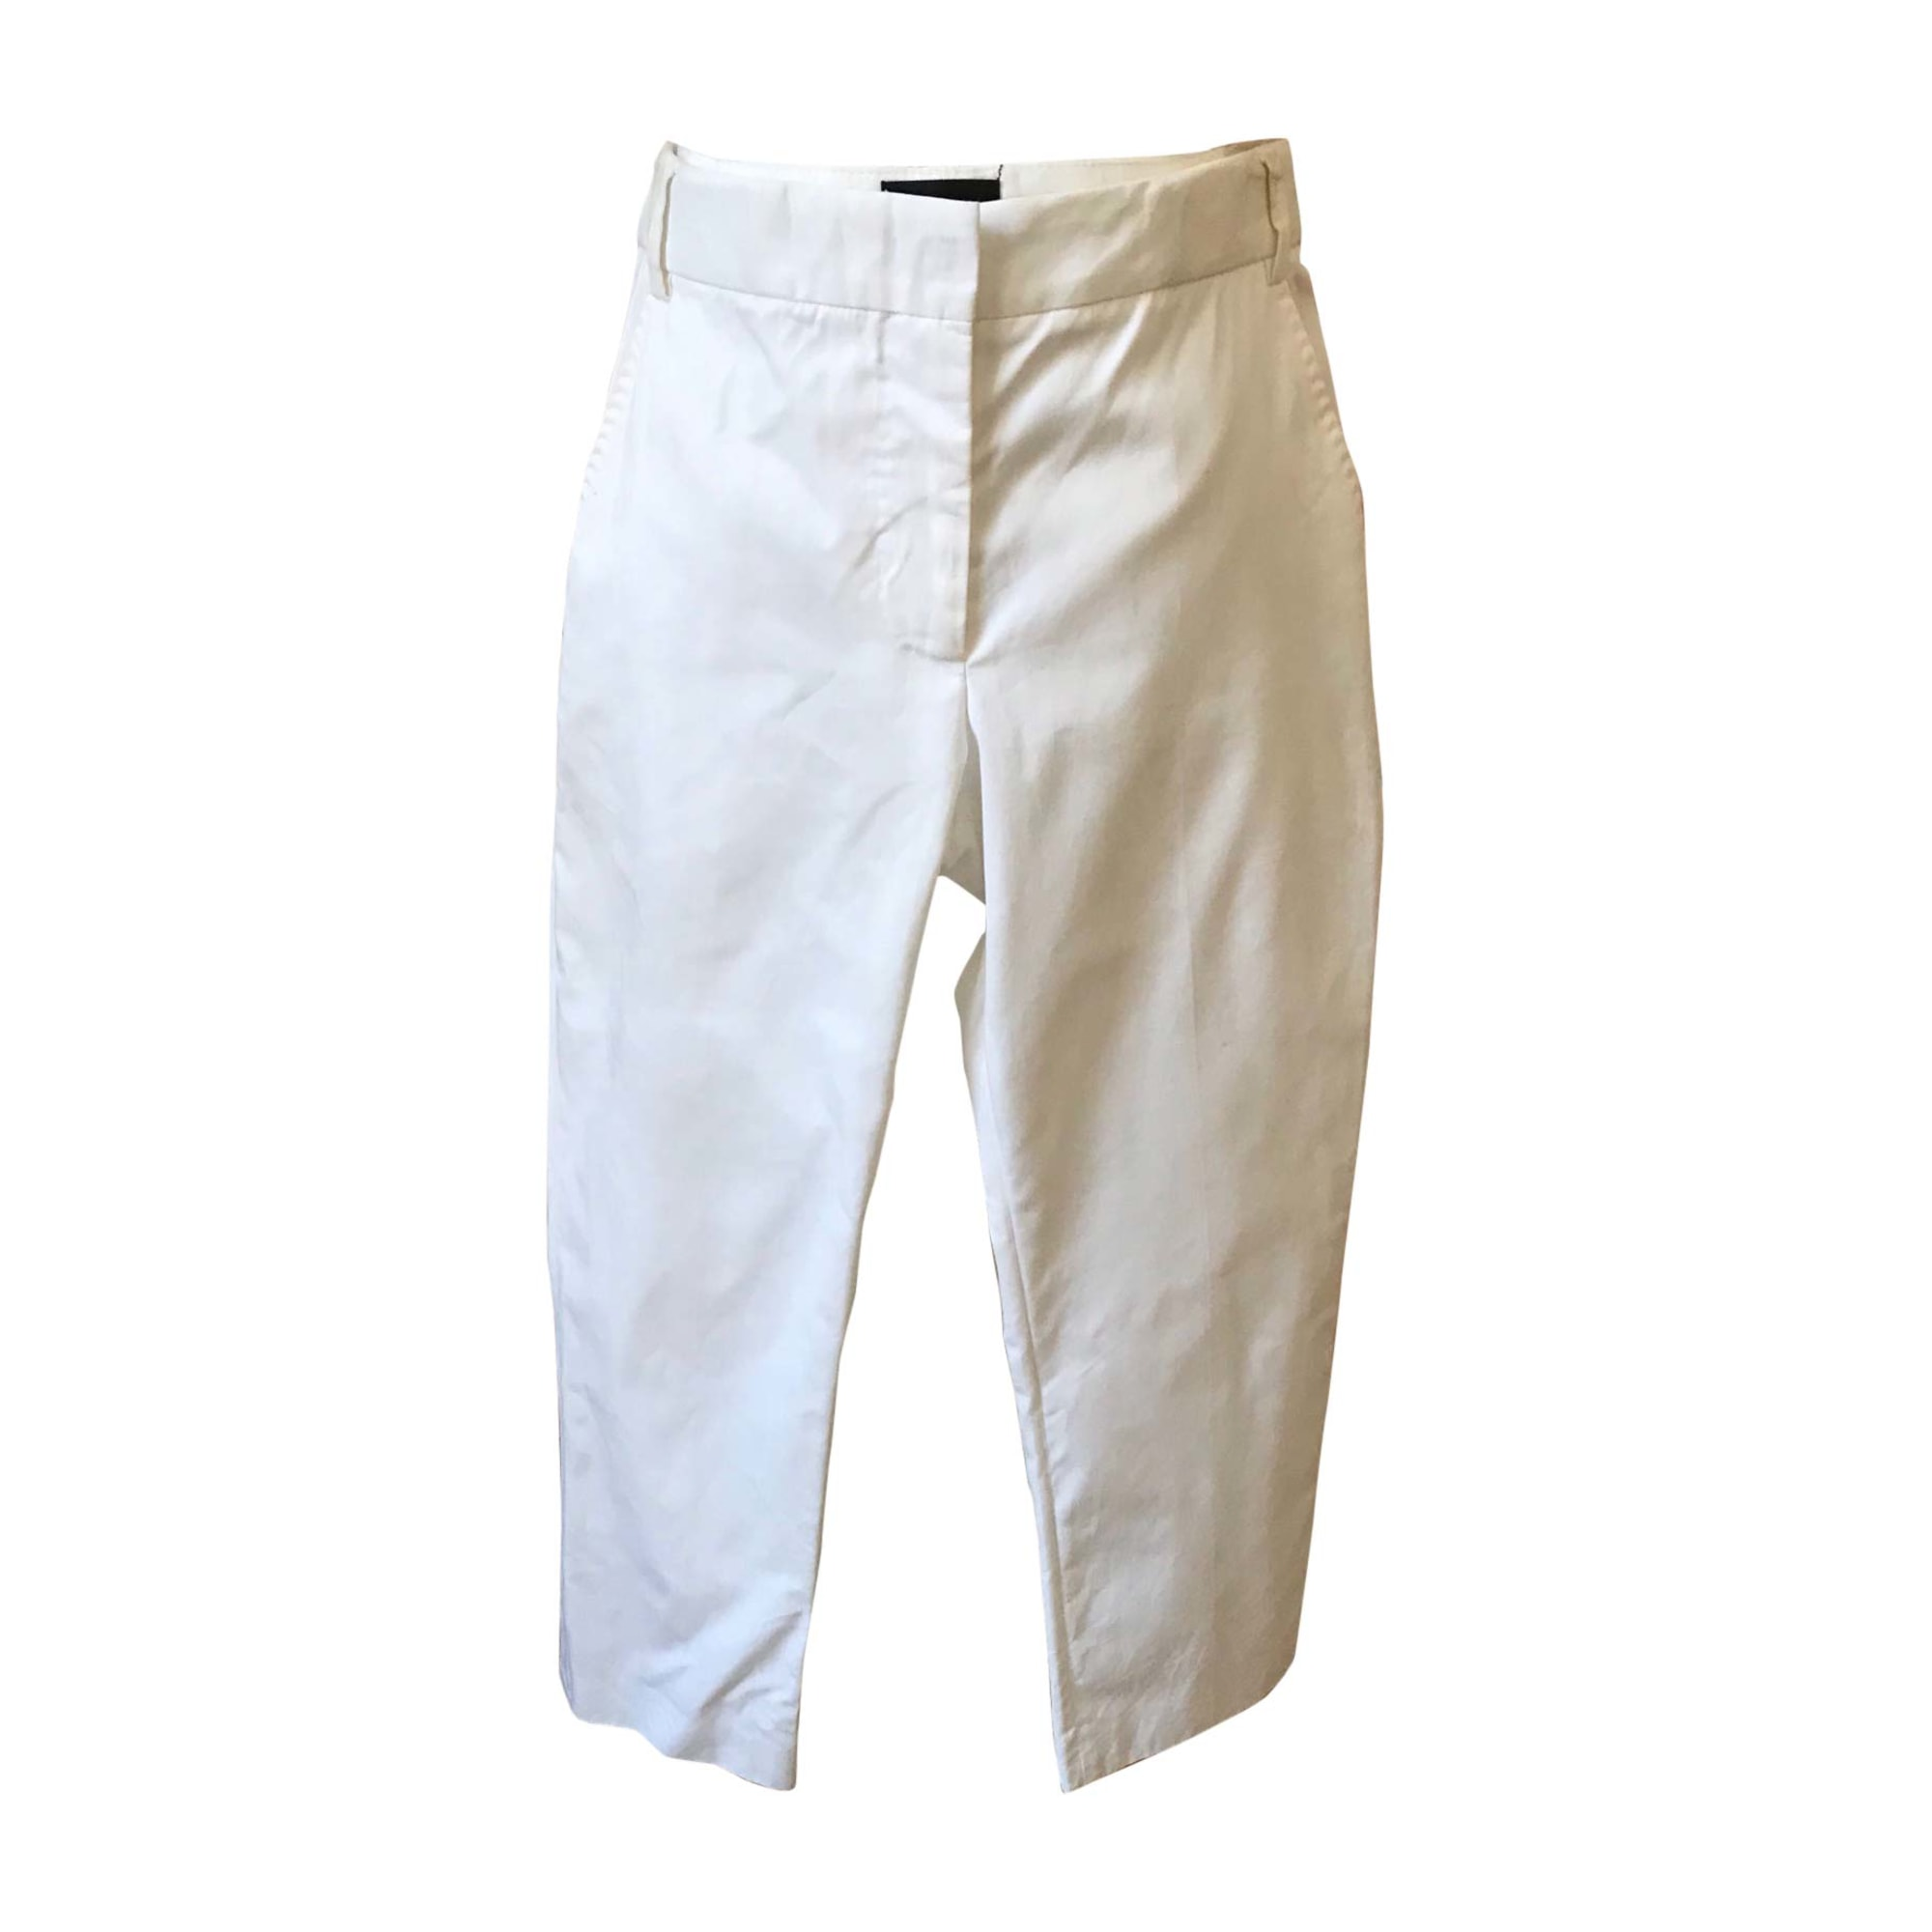 Pantalon droit PAUL SMITH Blanc, blanc cassé, écru